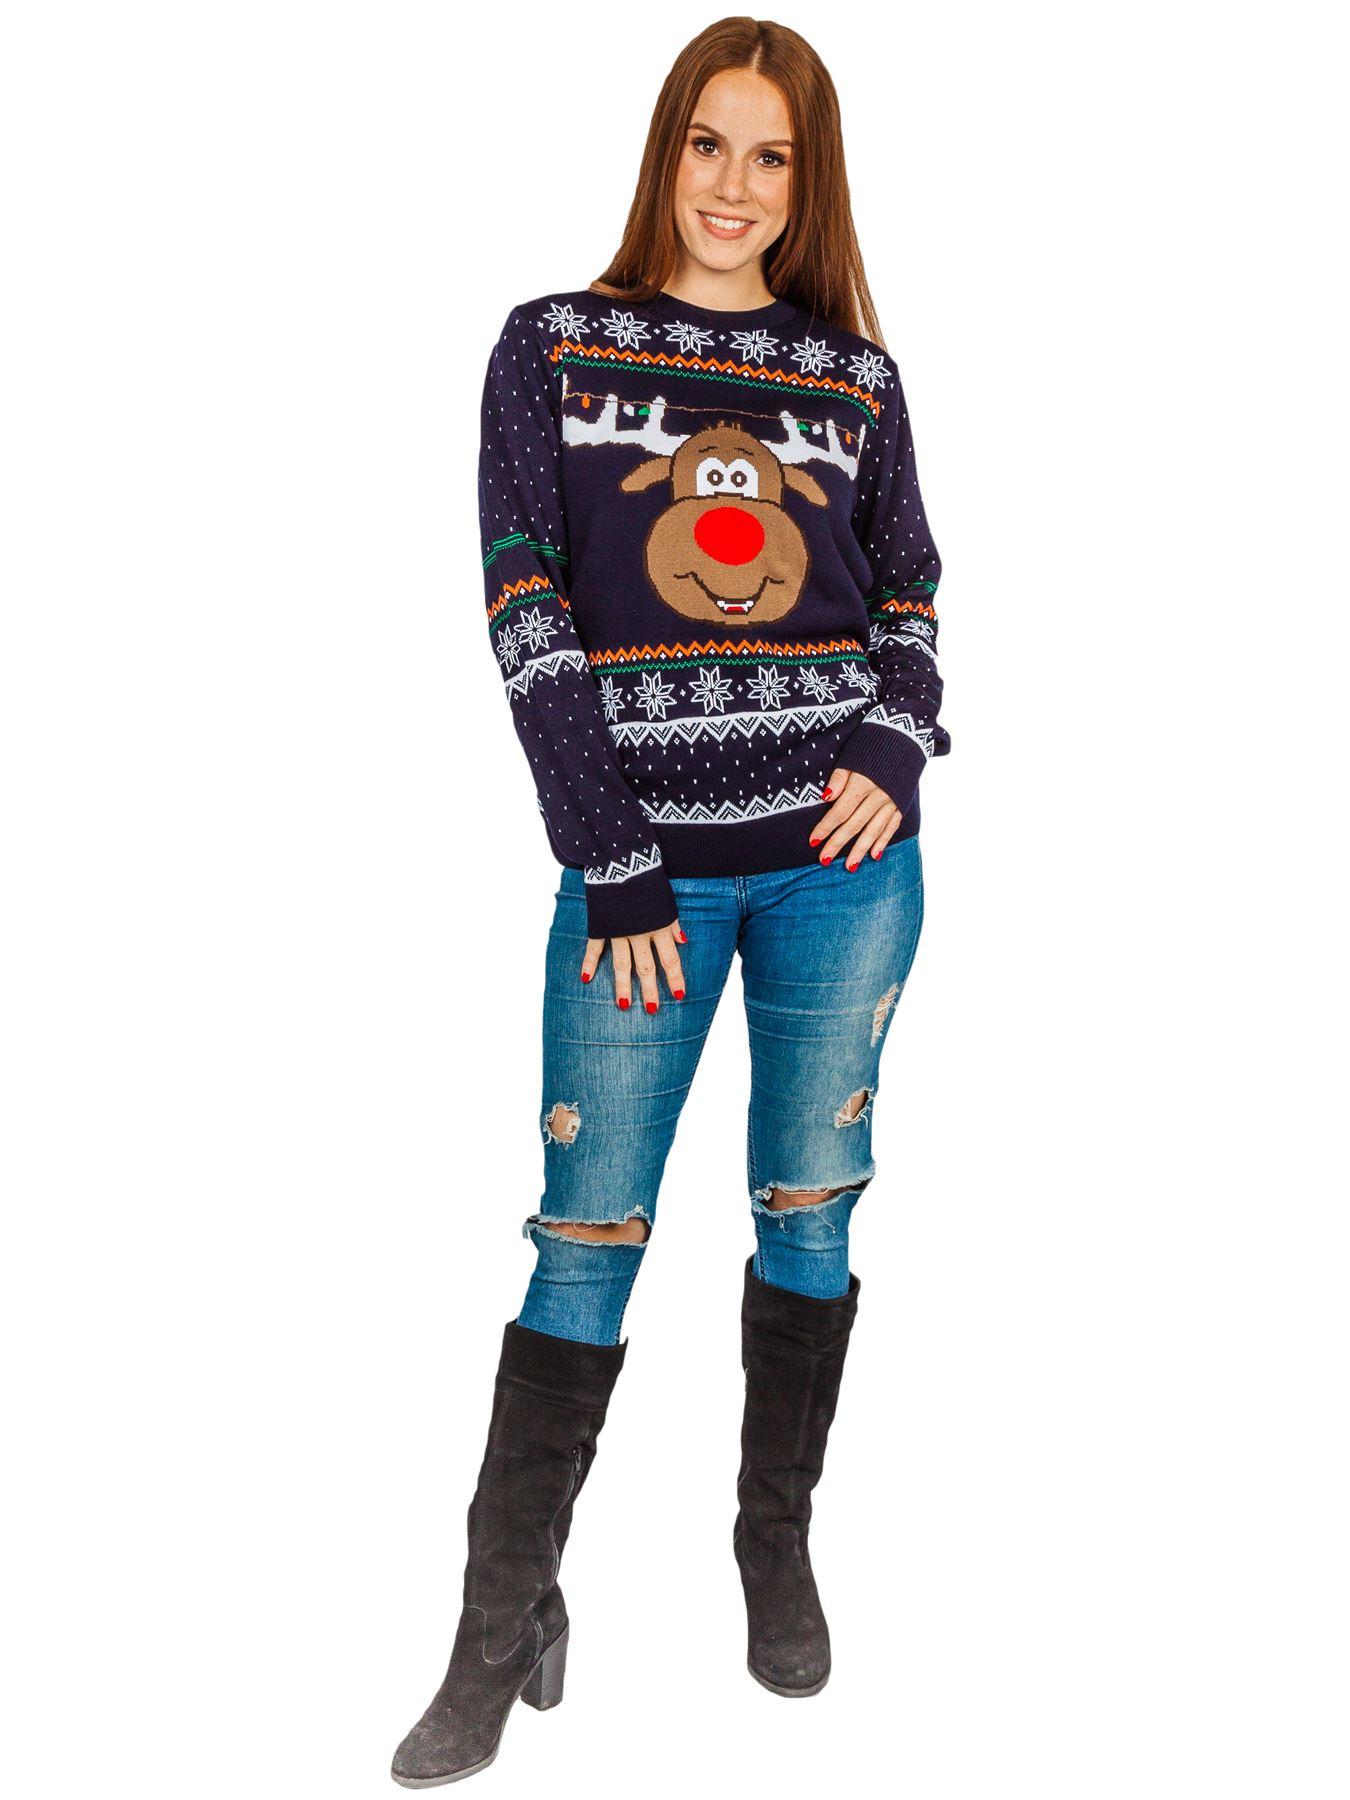 Unisex-Christmas-Jumper-Girls-Boys-Reindeer-Snow-Flake-Knitted-Pullover-Sweater thumbnail 4